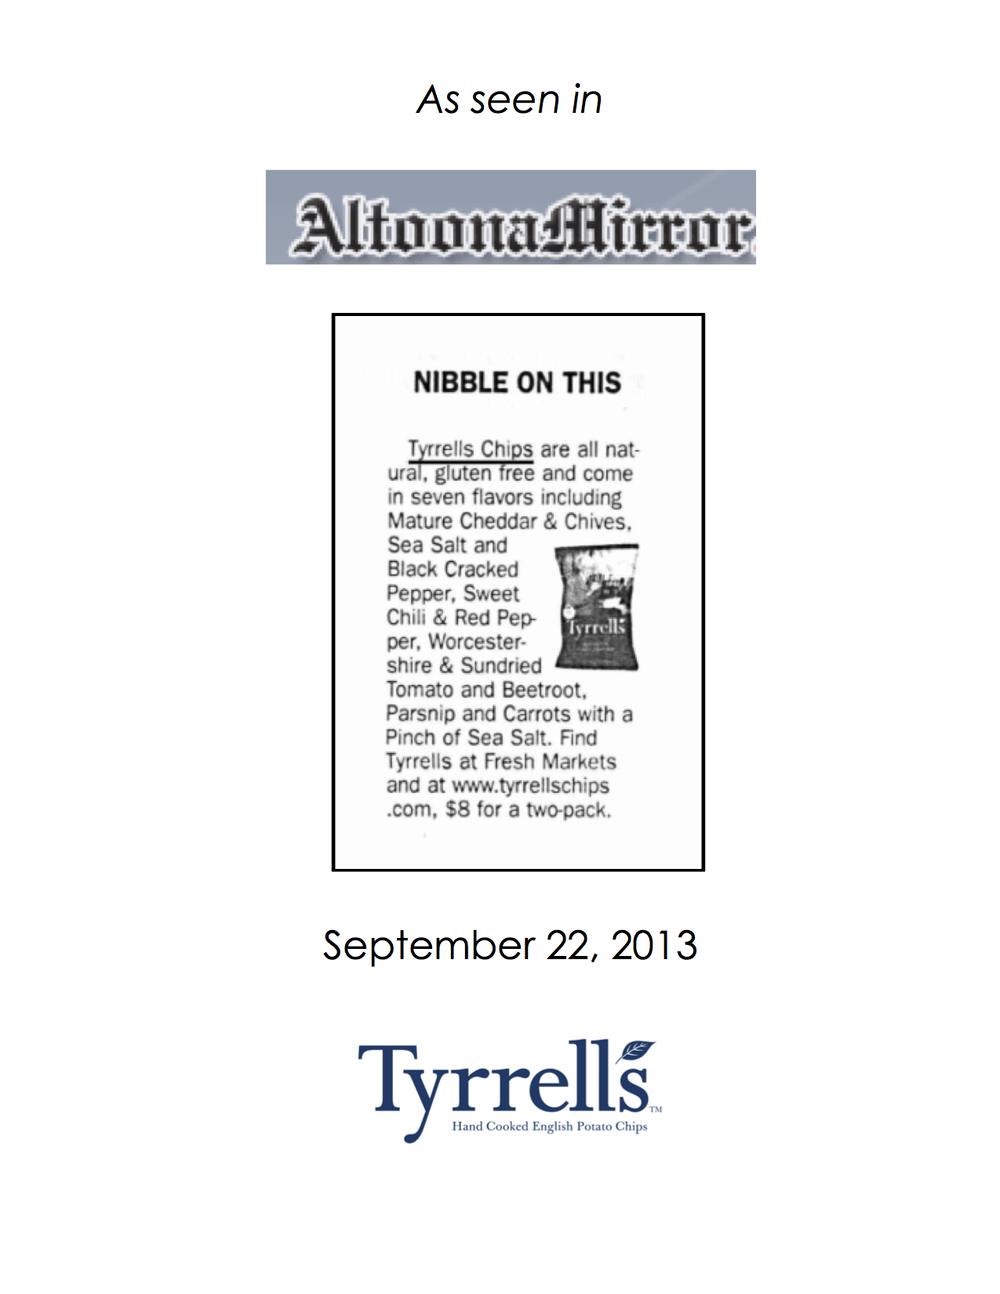 tyrrells-asseenin-altoonamirror copy.jpg